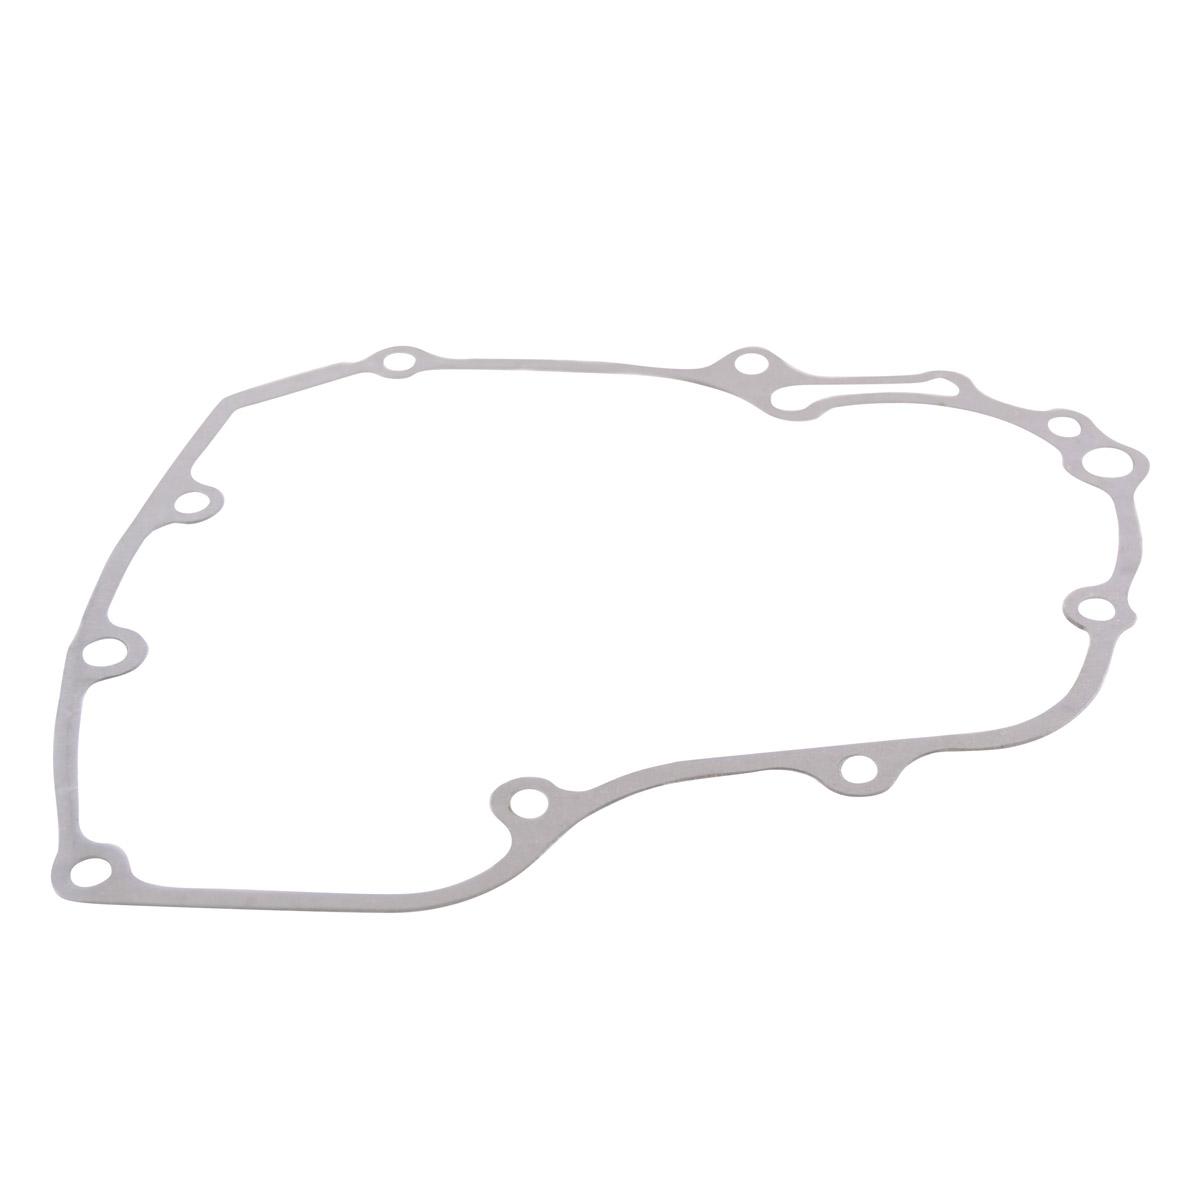 Stator Crankcase Cover Gasket For Honda TRX 450 Sportrax